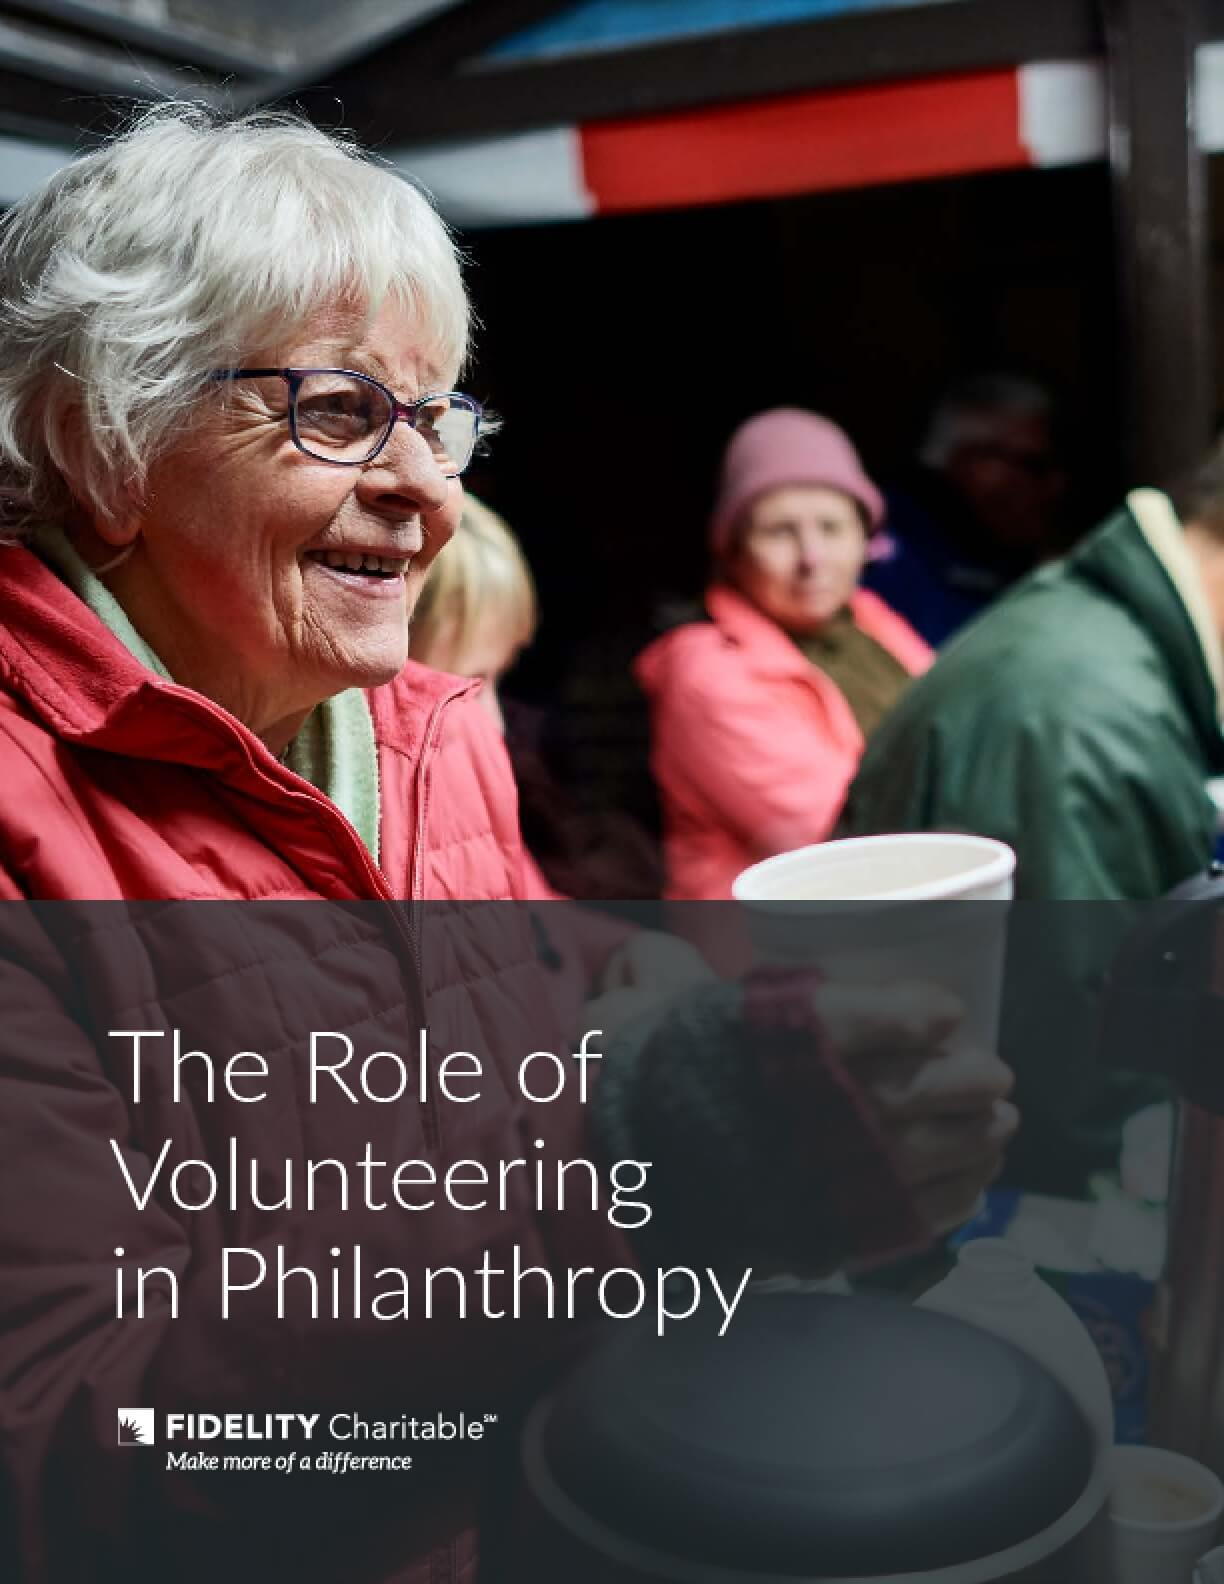 The Role of Volunteering in Philanthropy